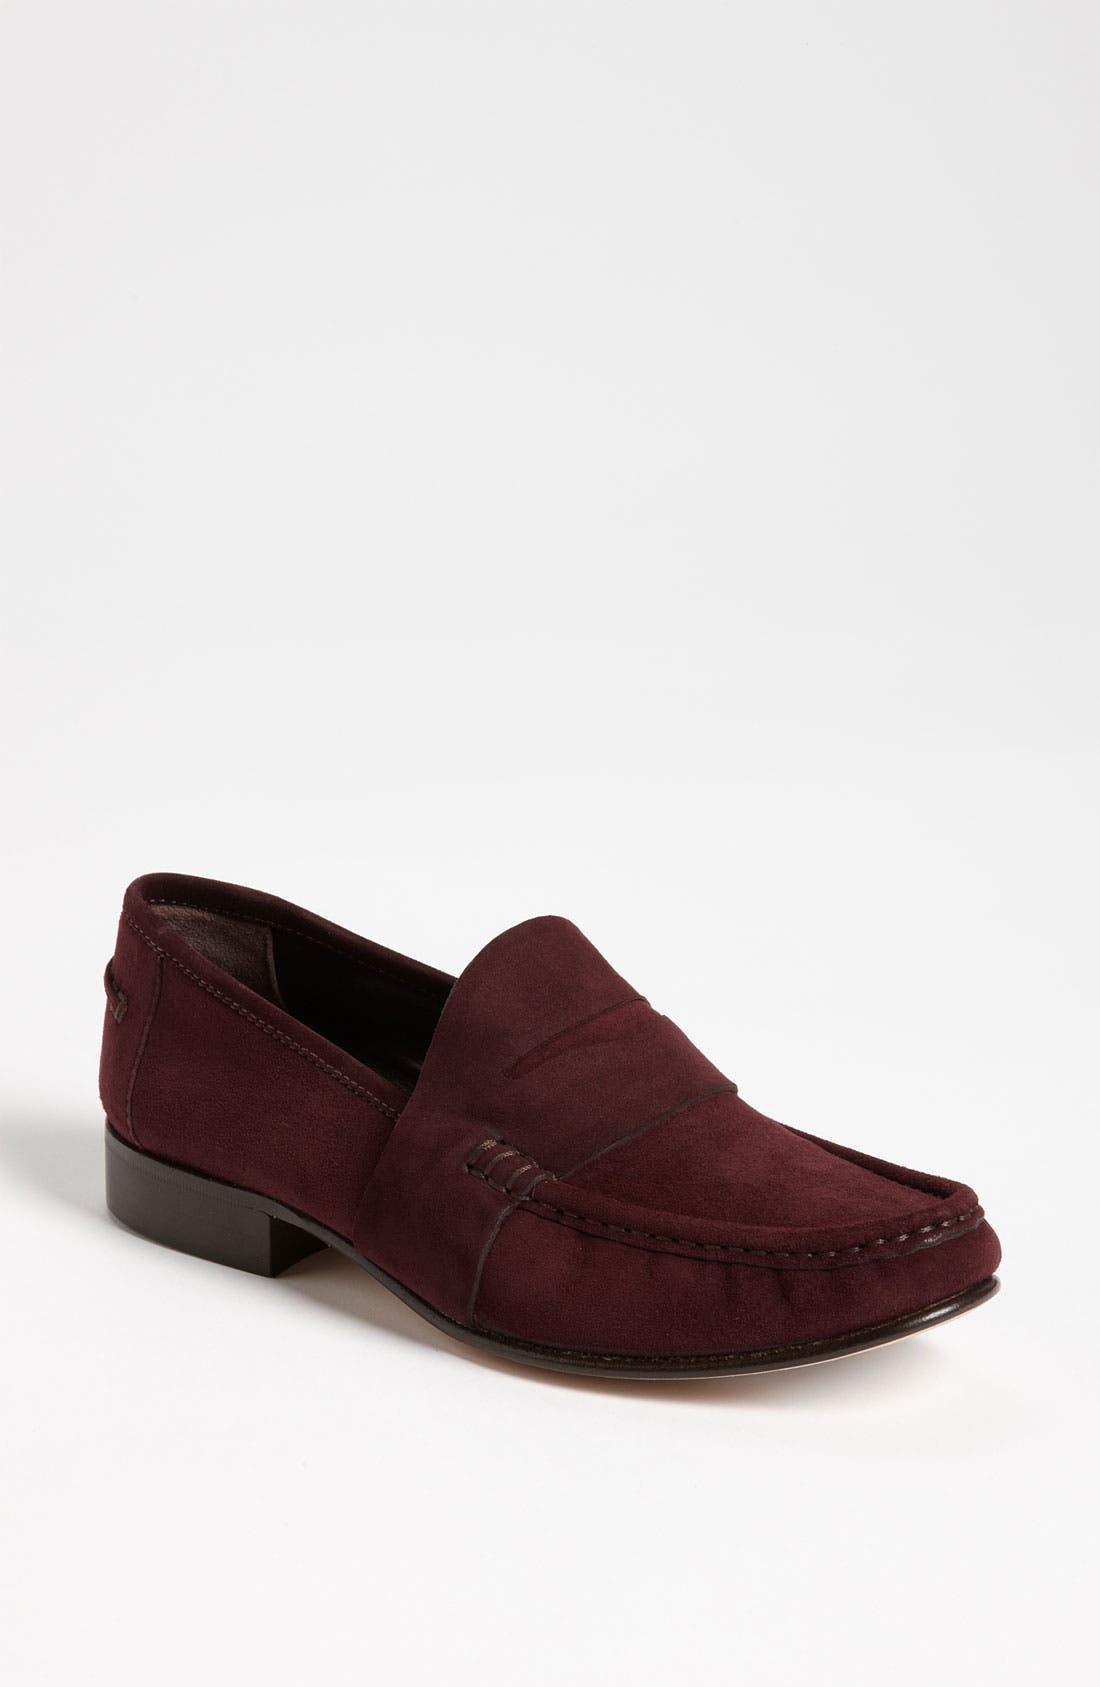 Alternate Image 1 Selected - Vera Wang Footwear 'Audrey' Loafer